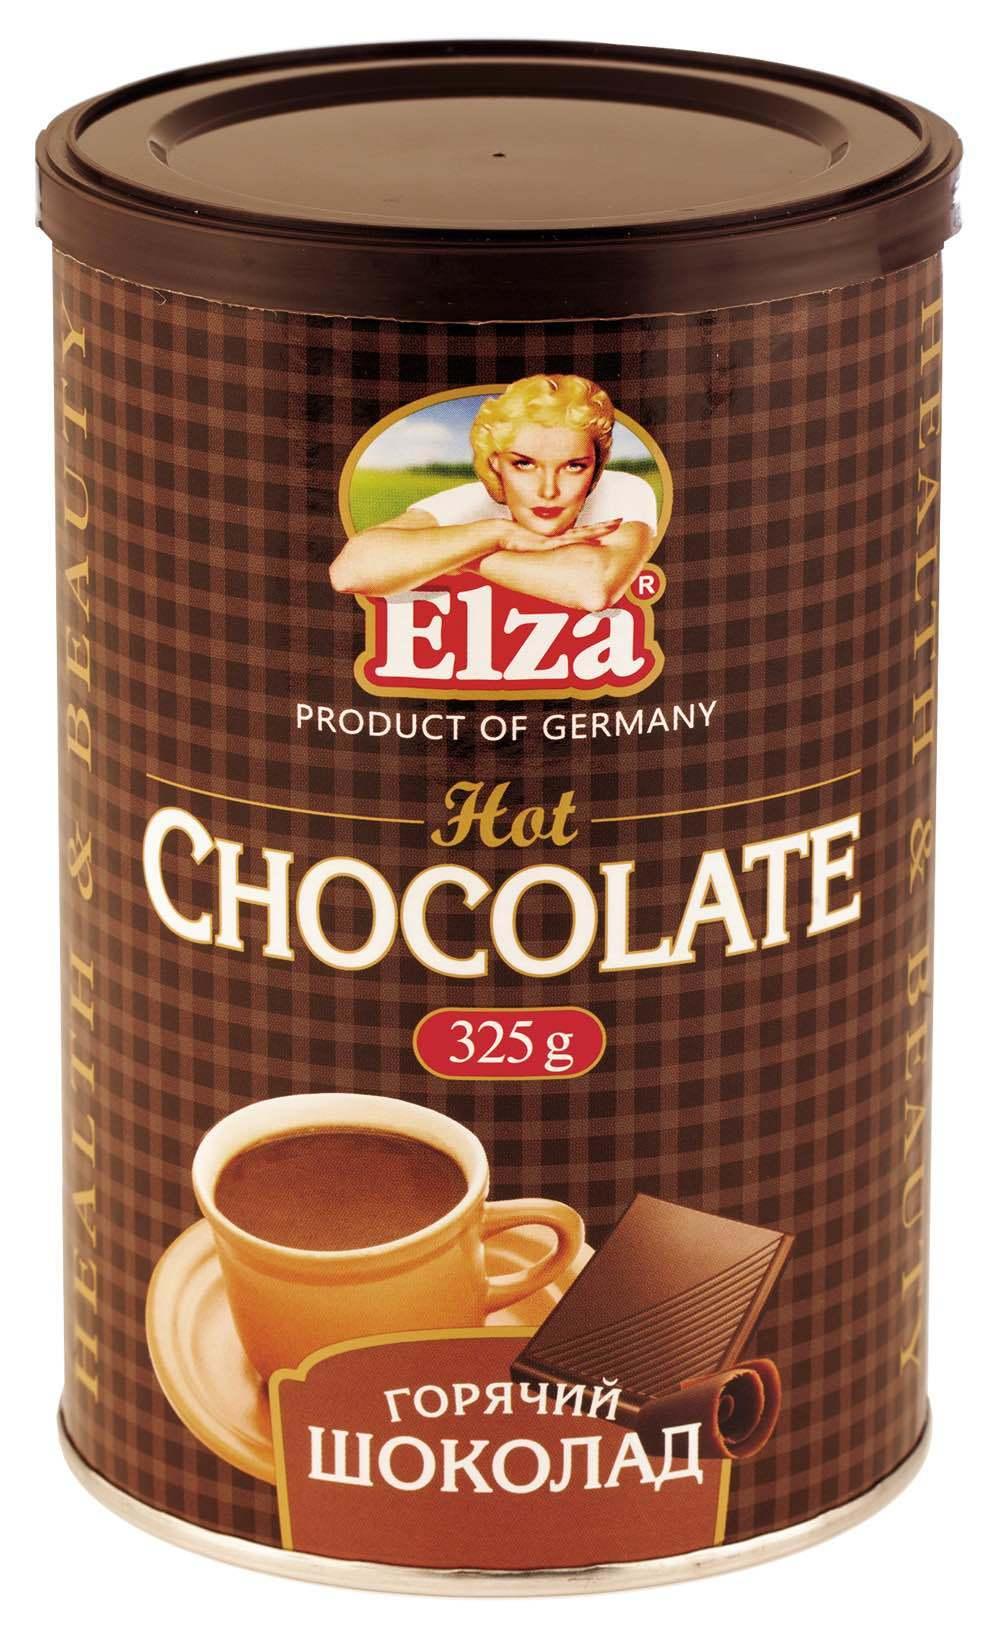 Горячий шоколад Горячий шоколад, Elza, 325 г import_files_0a_0a6e3d5bcb2511eaa9ce484d7ecee297_d75208d2cd7f11eaa9ce484d7ecee297.jpg